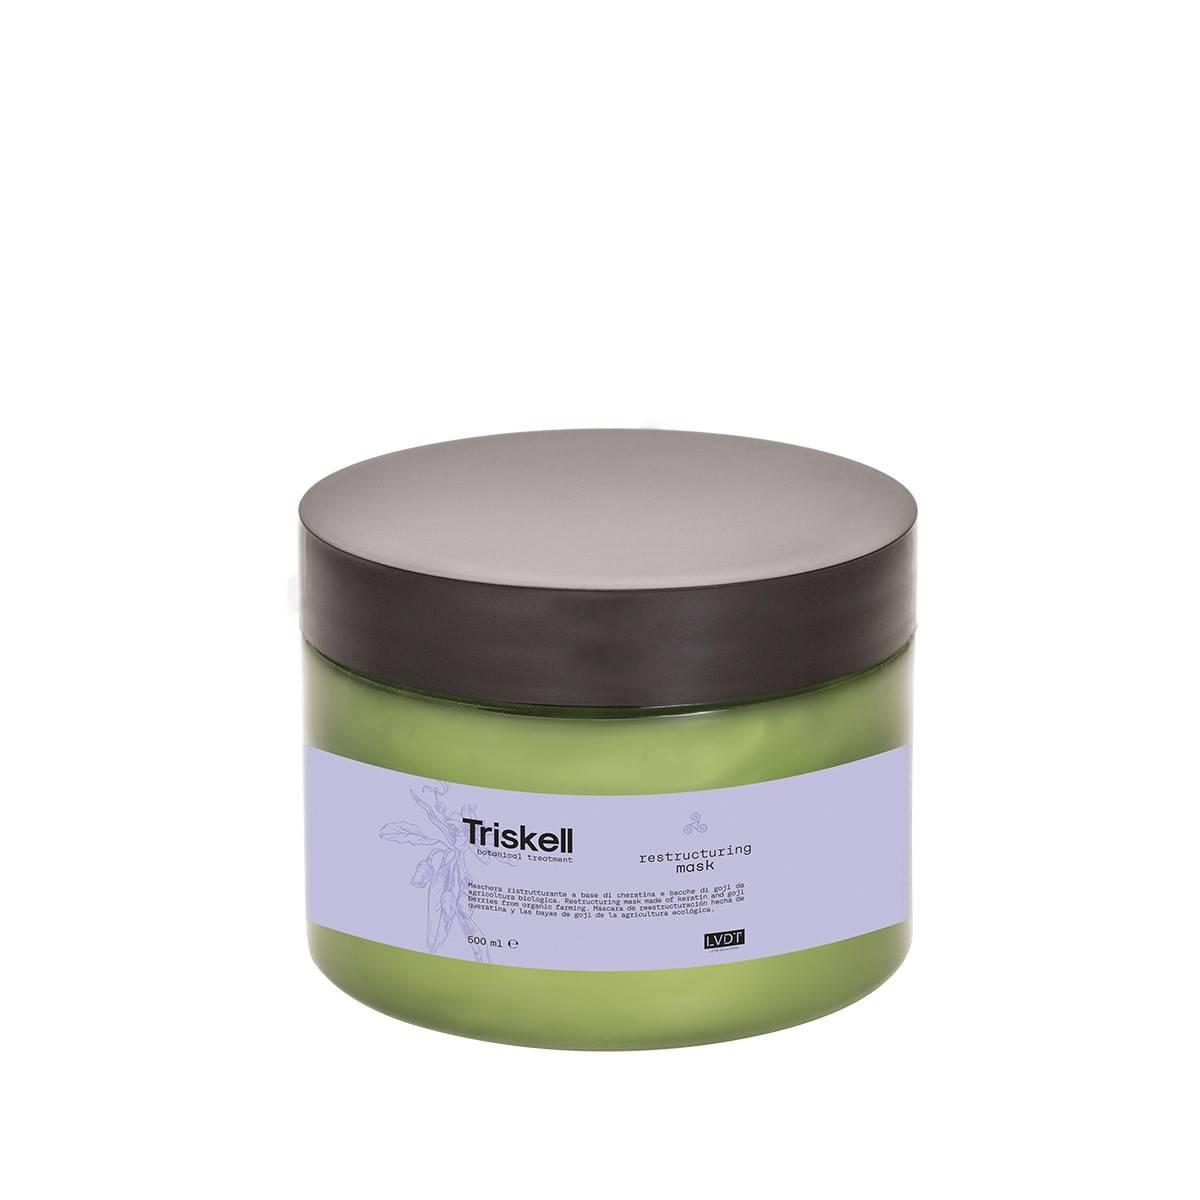 Restructuring Mask 500ml Triskell Nuova Botanical Treatment